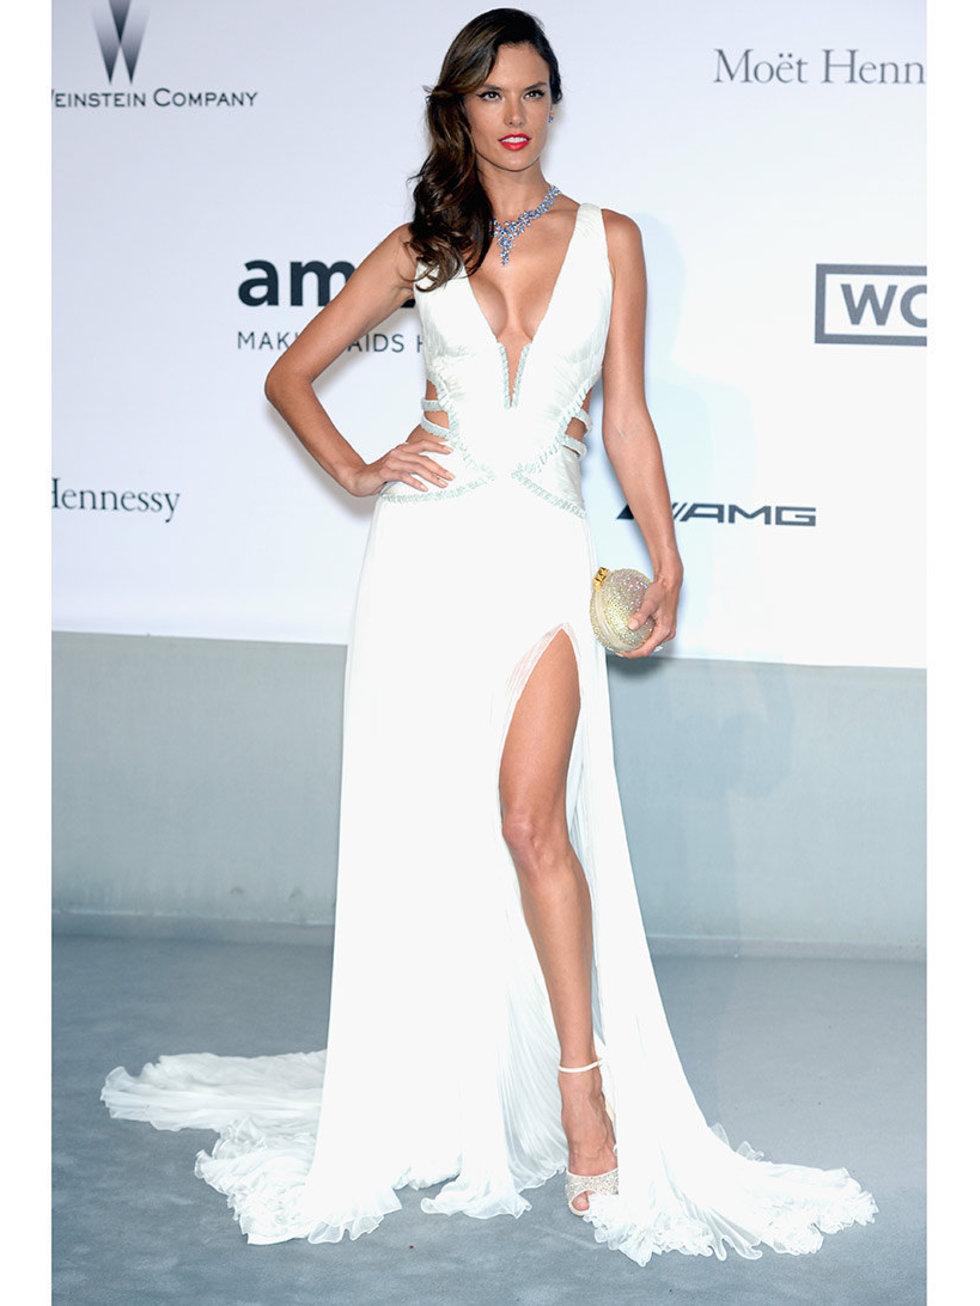 adriana lima wedding dress » Wedding Dresses Designs, Ideas and ...